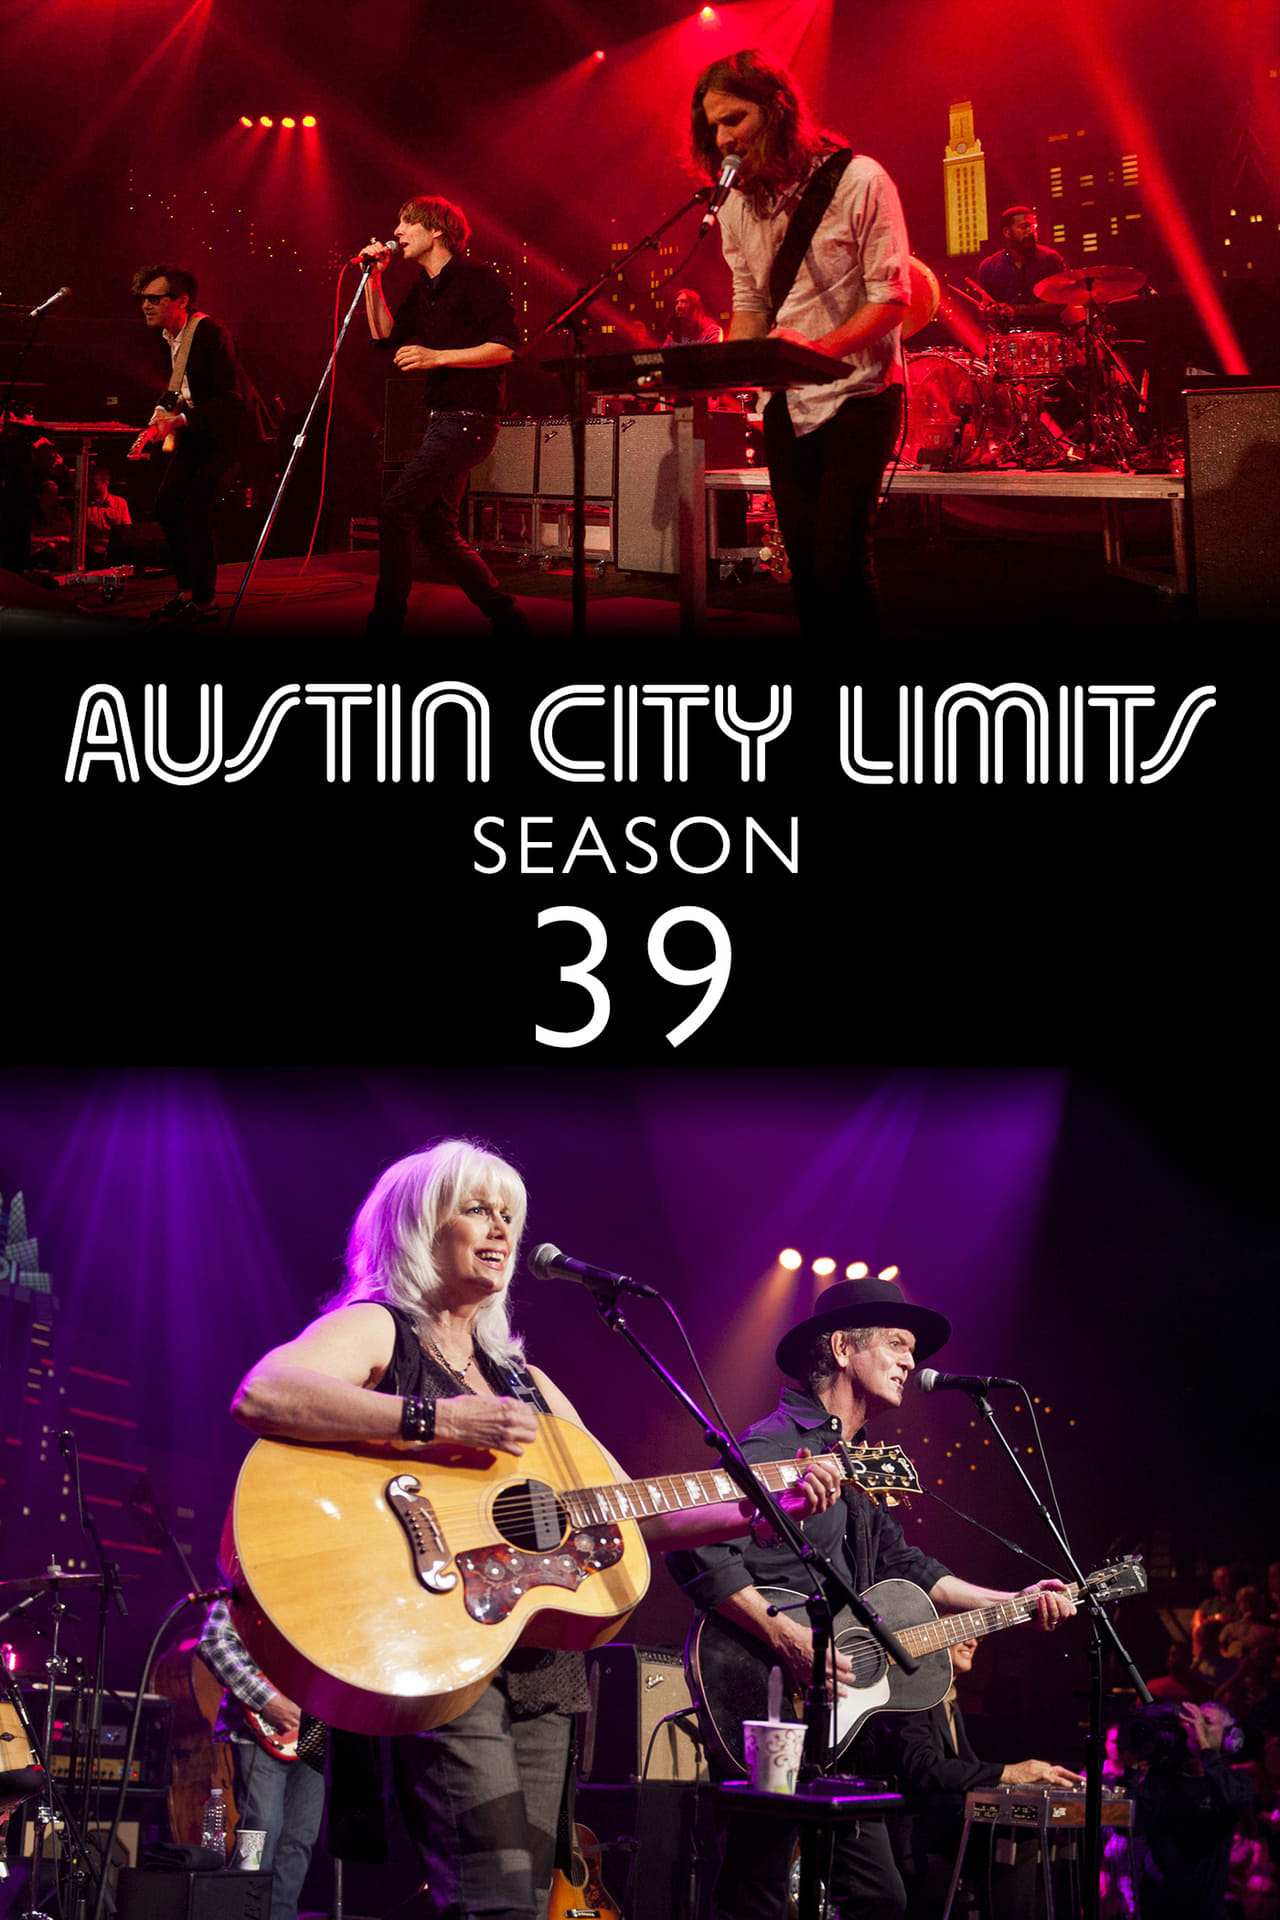 Putlocker Austin City Limits Season 39 (2013)